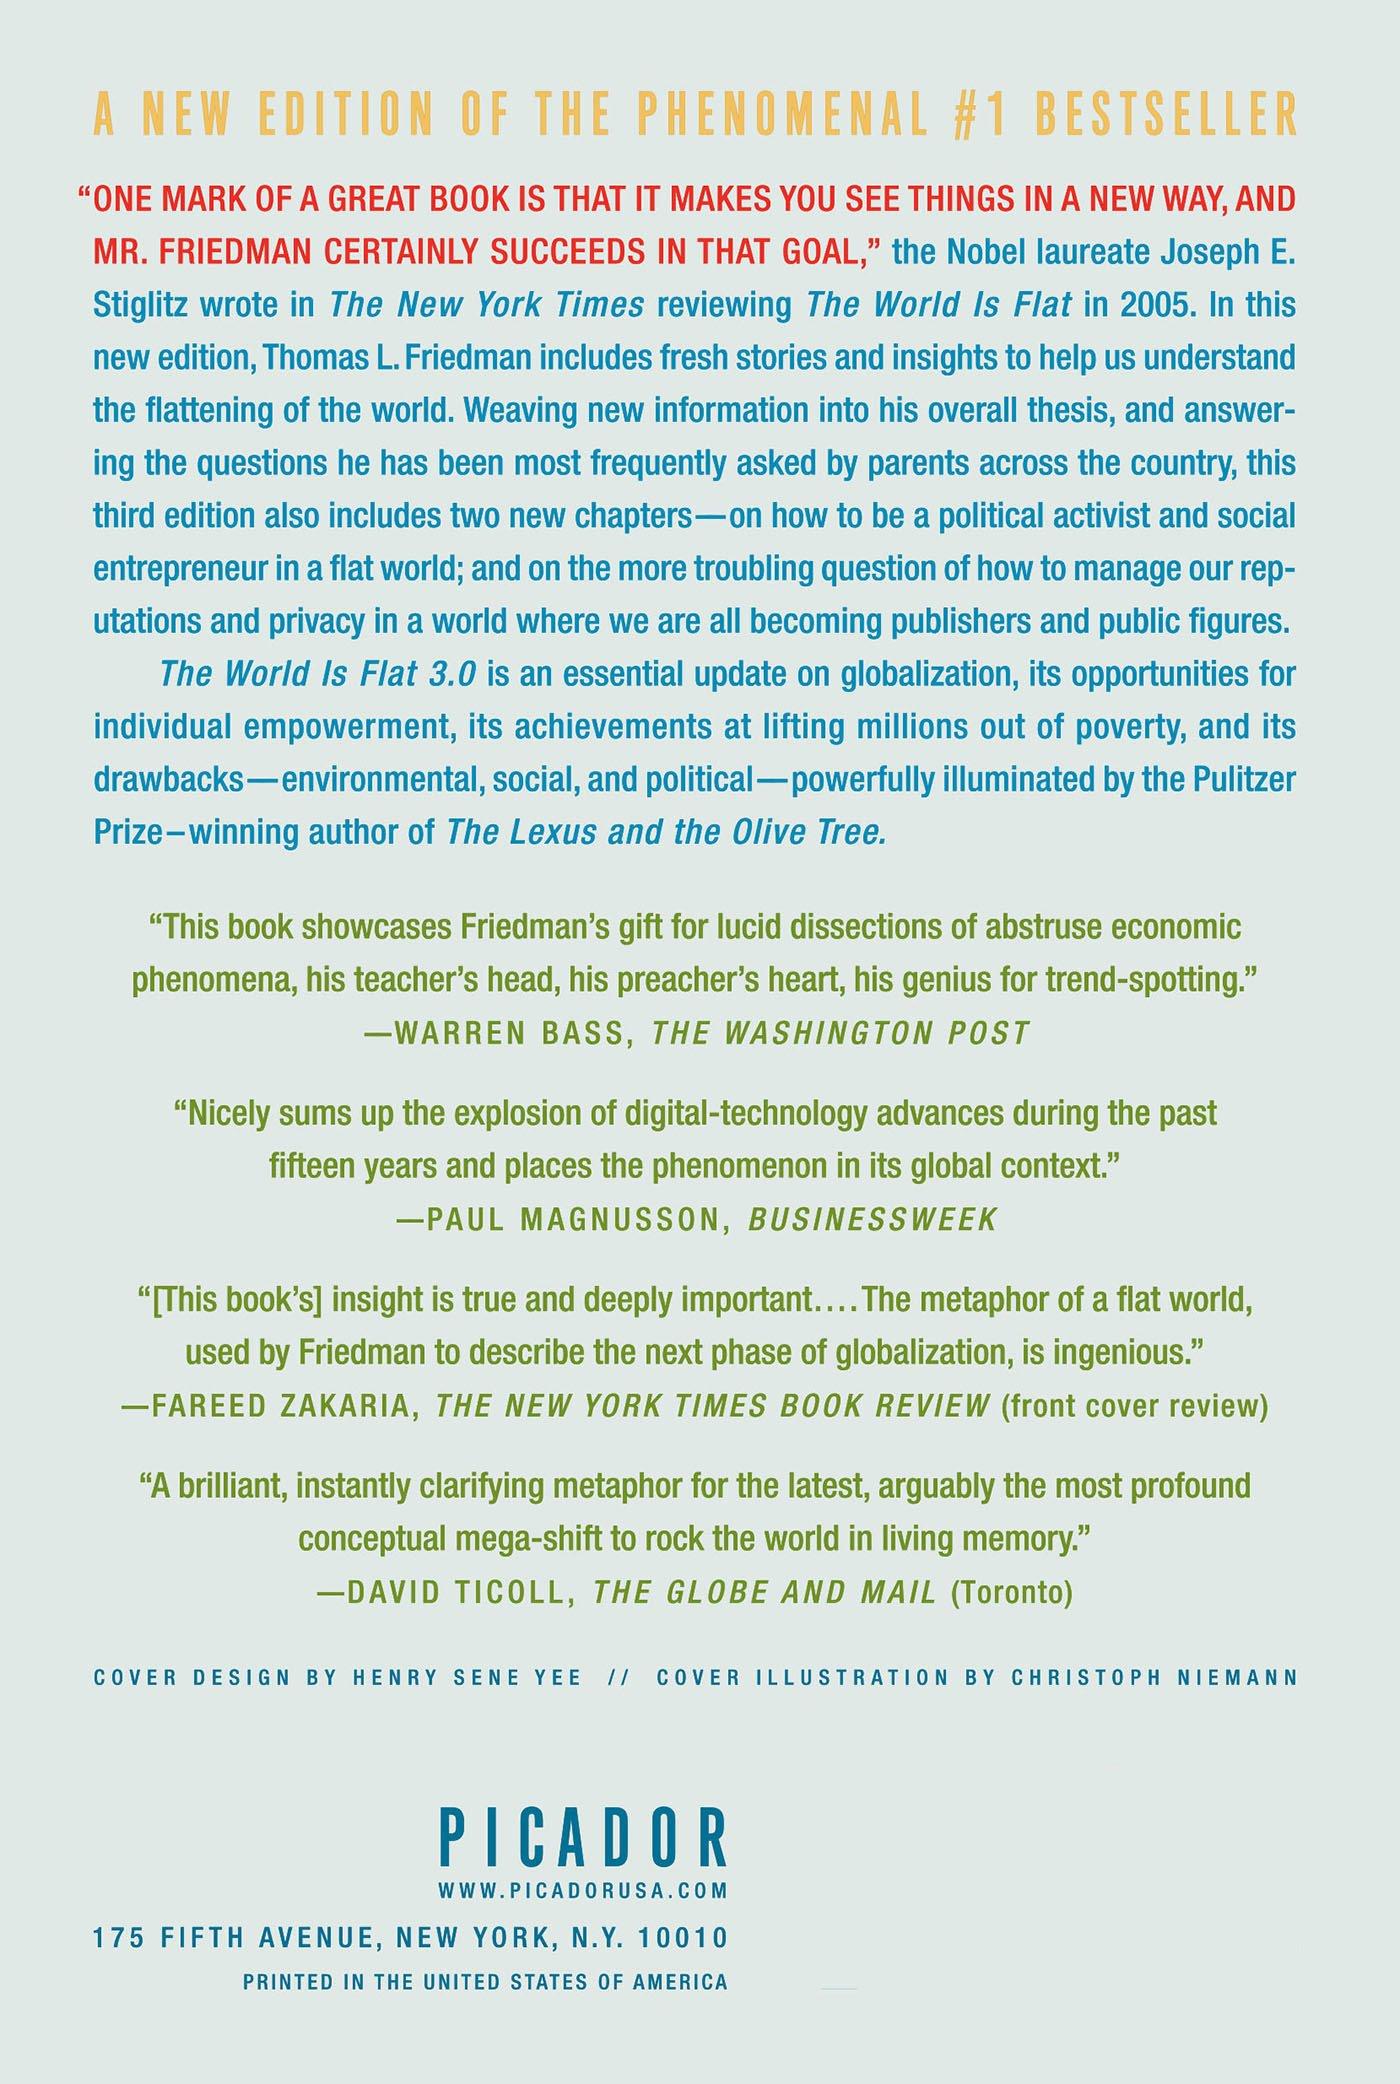 The World Is Flat 3.0: A Brief History of the Twenty-first Century: Thomas  L. Friedman: 9780312425074: Amazon.com: Books